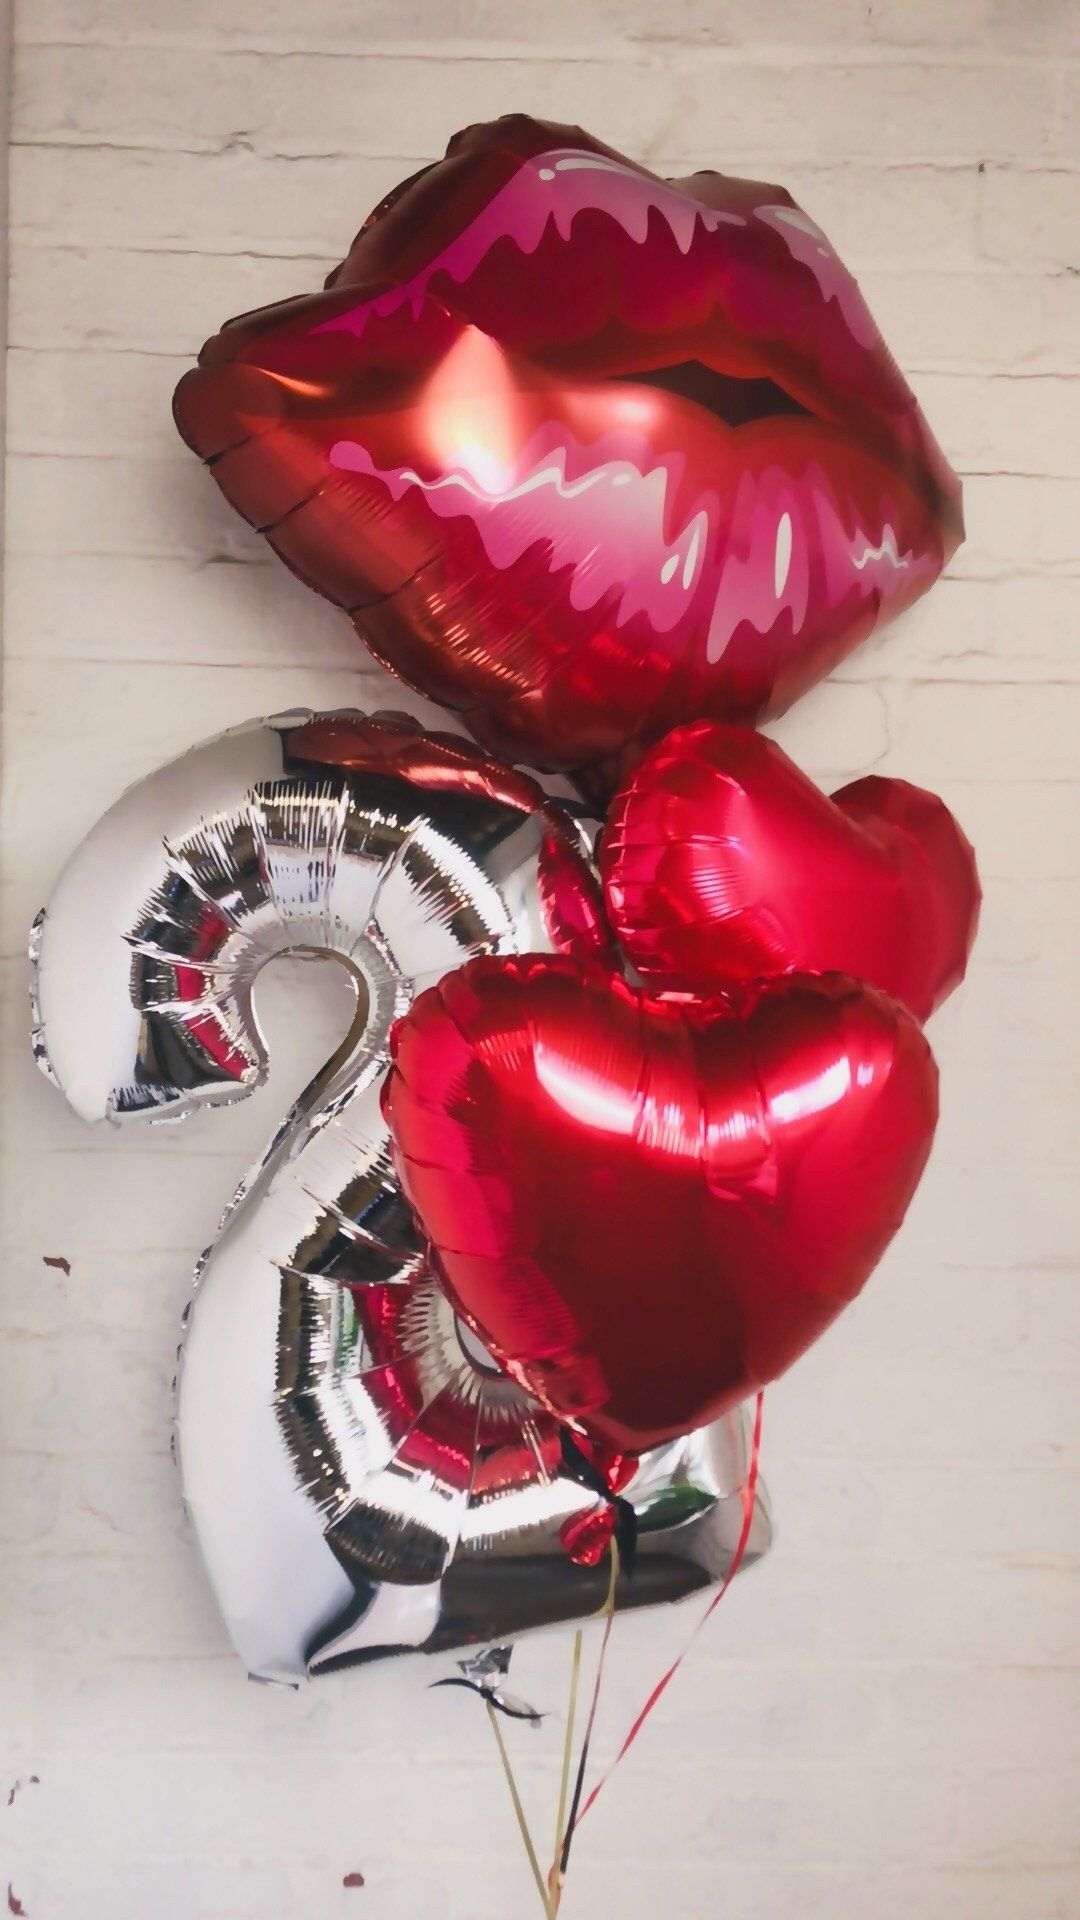 Party Balloons Red Kiss Lips Valentine Wedding Decor Helium Foil Love 2 PCS